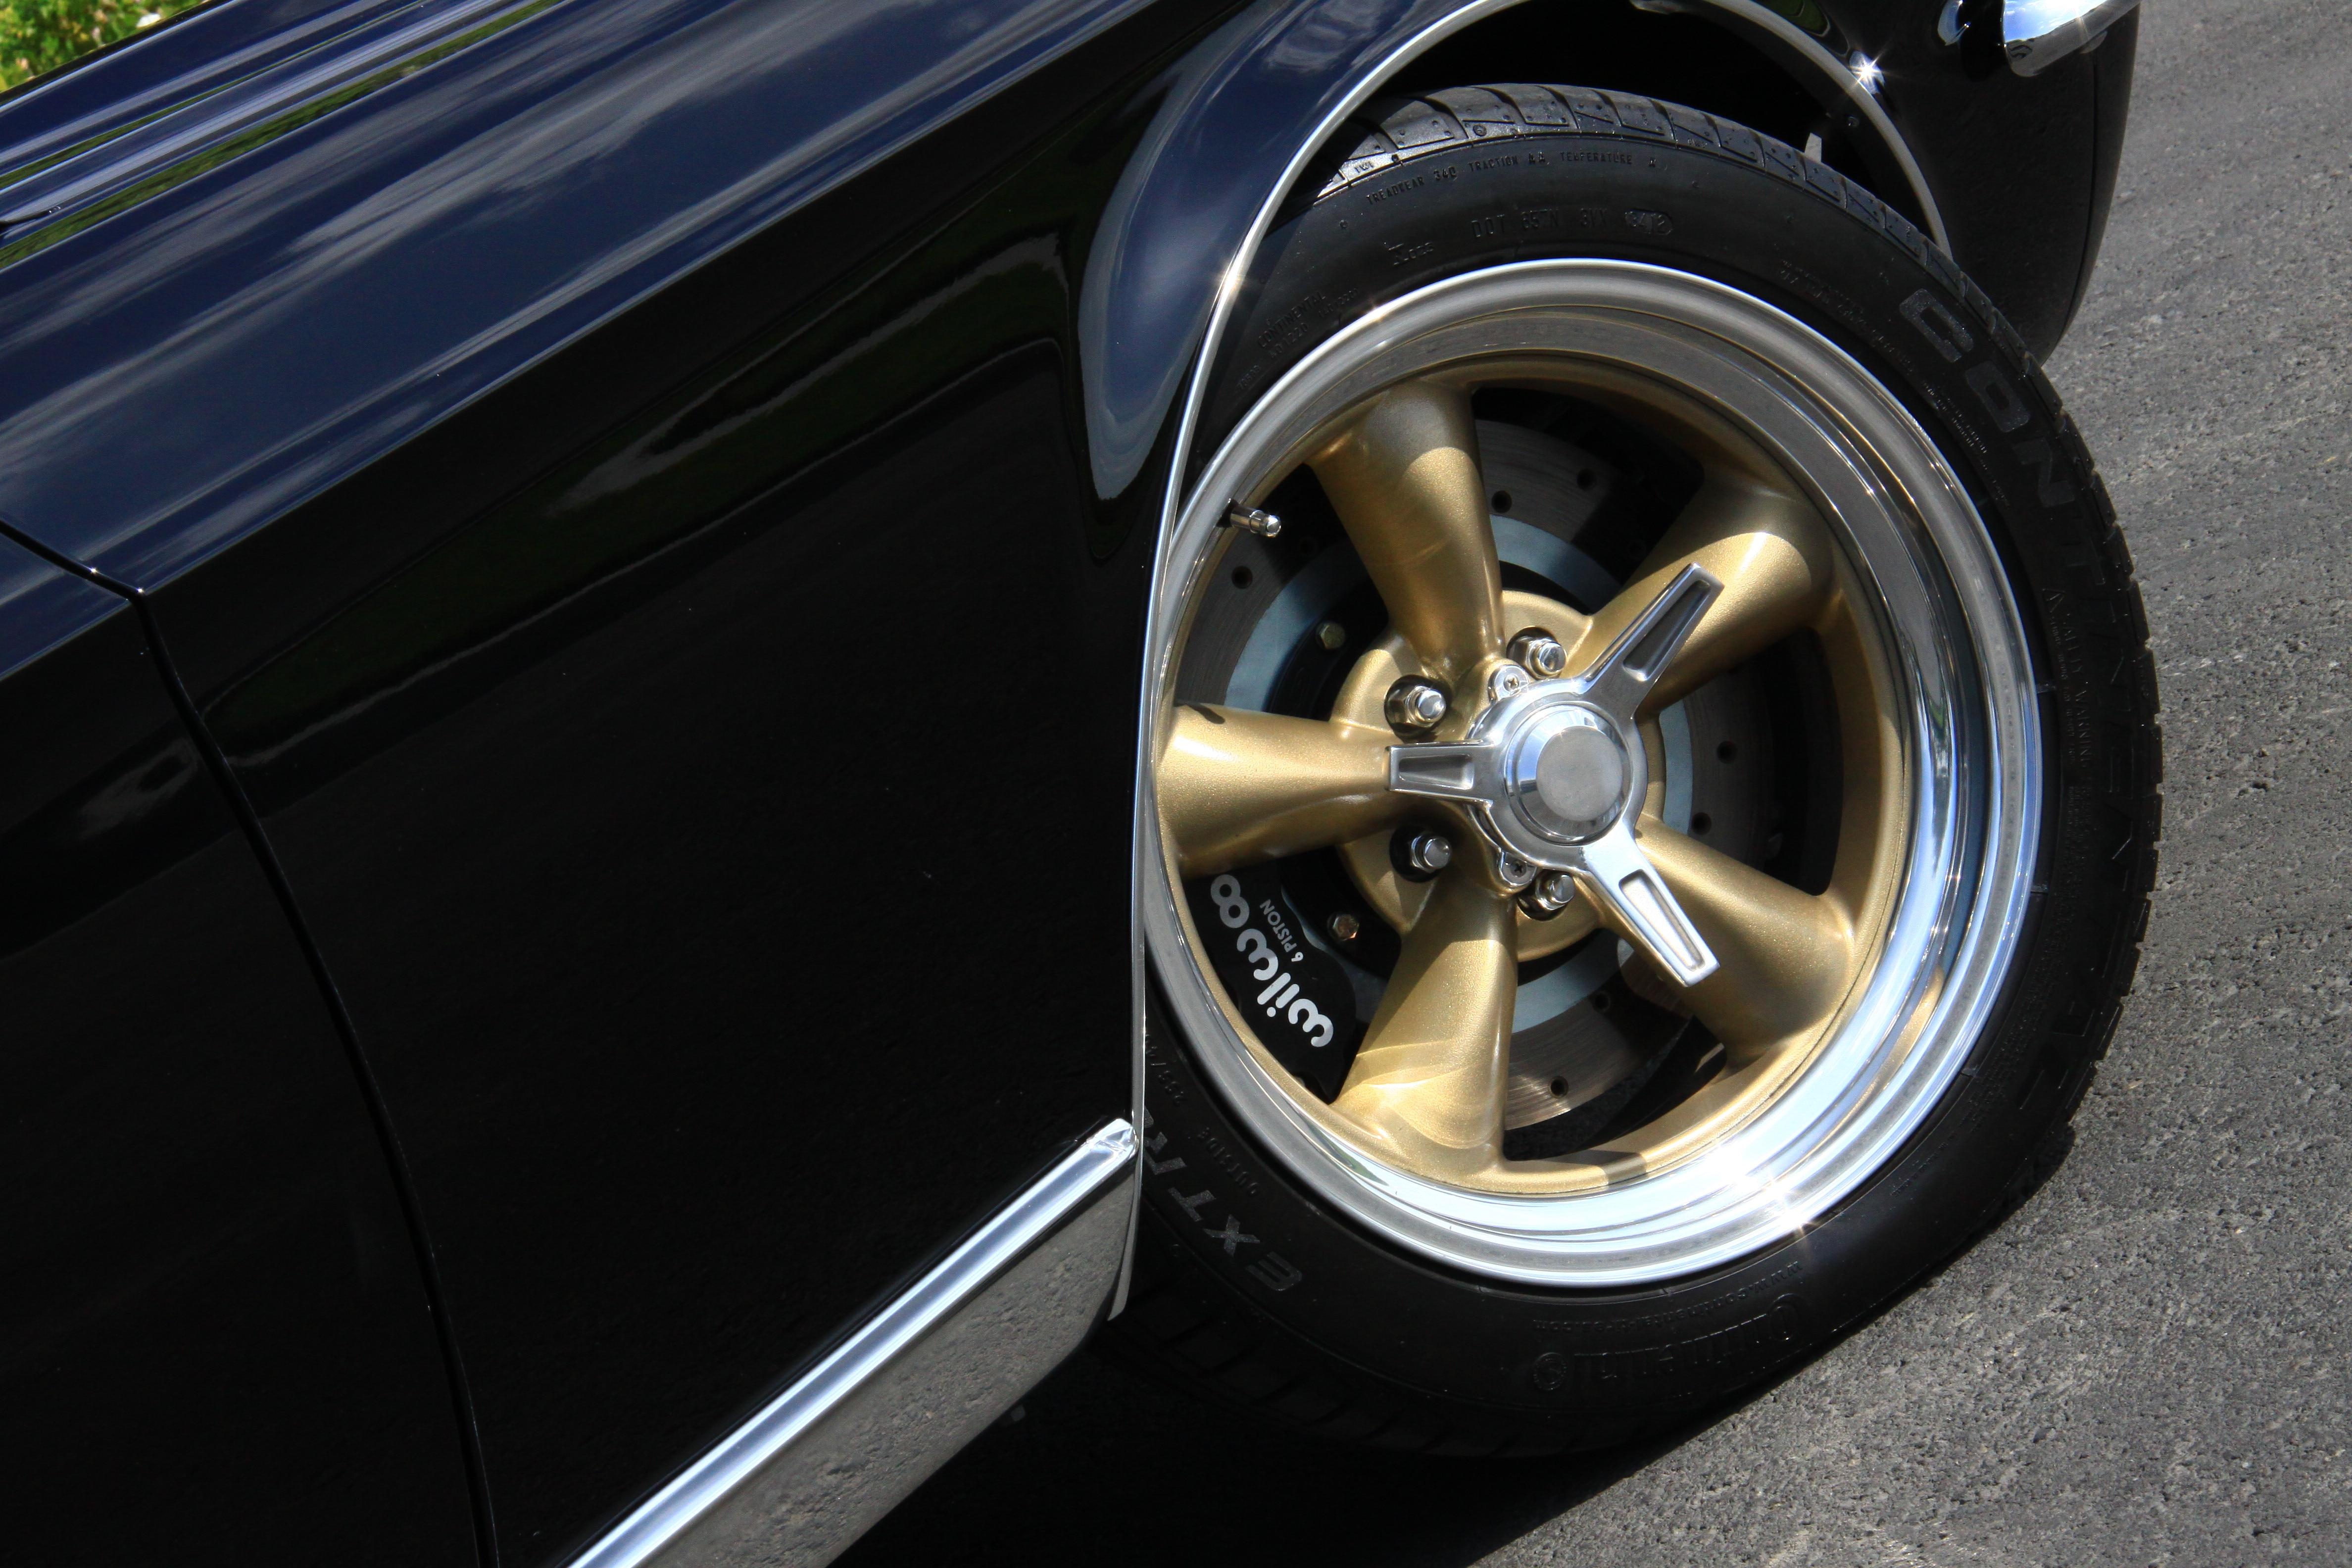 6 1967 Ford Mustang Vintage 45 Wheels